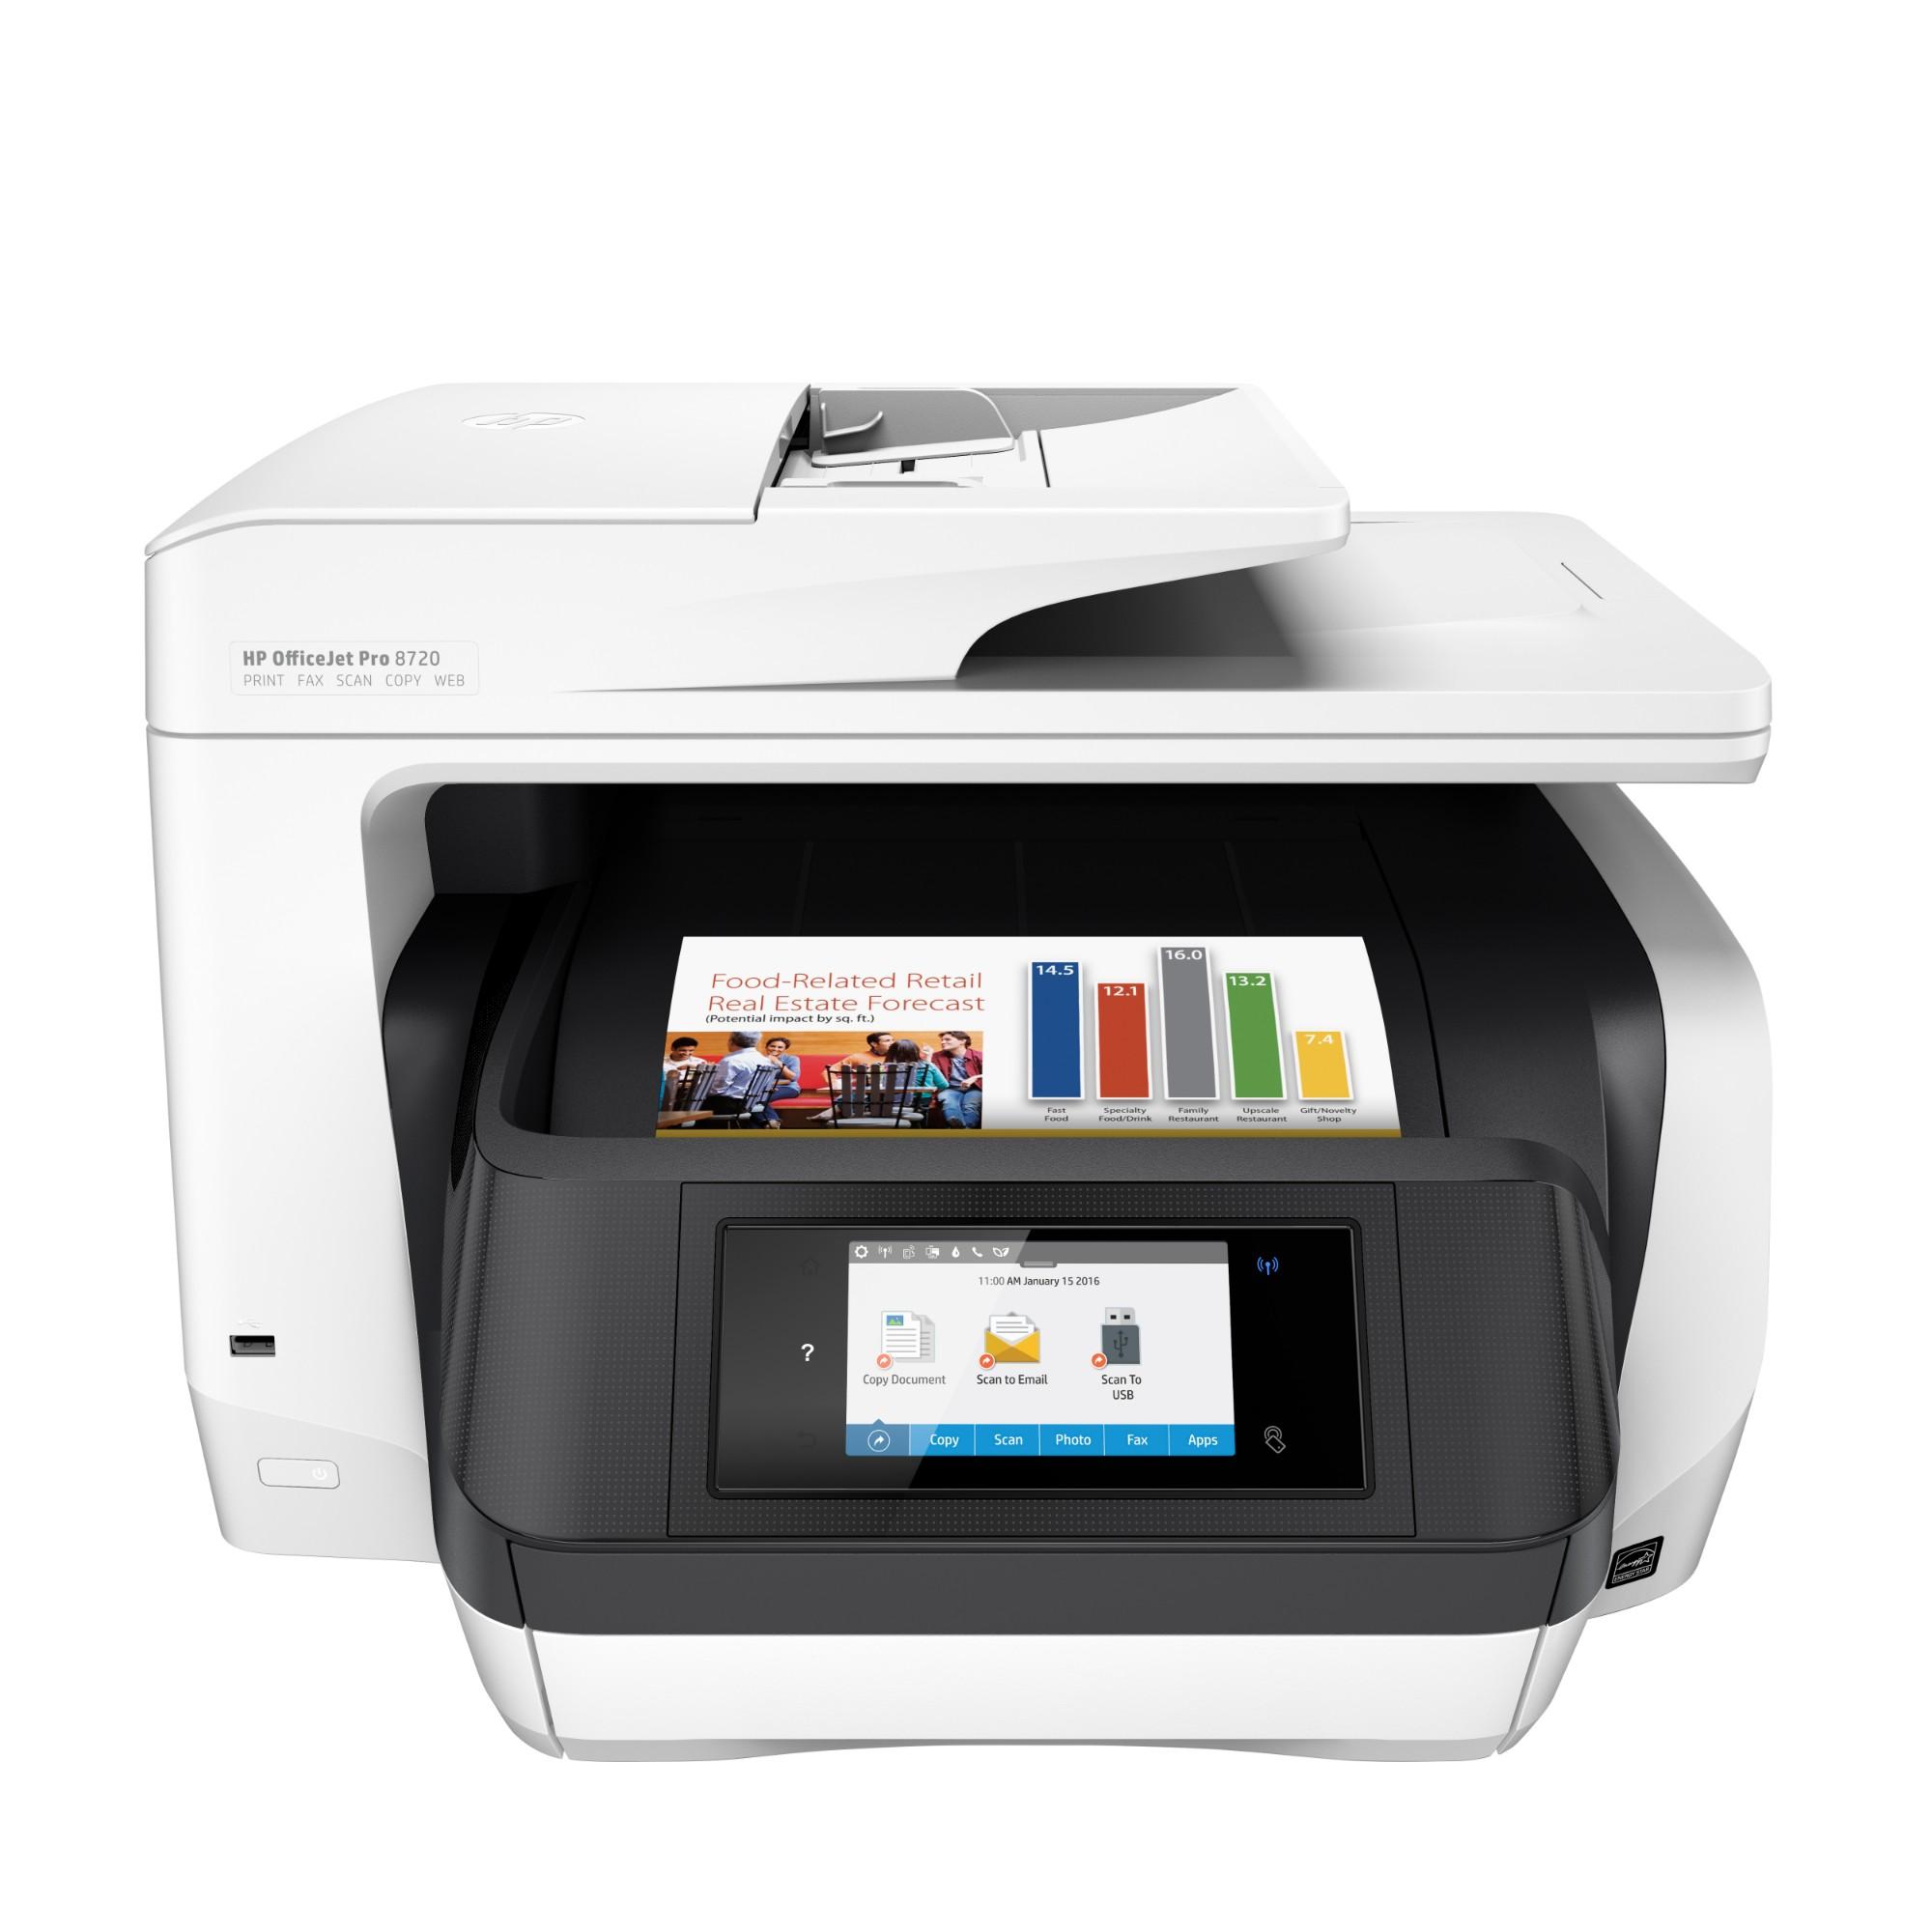 HP OfficeJet Pro 8720 Thermal Inkjet 24 ppm 4800 x 1200 DPI A4 Wi-Fi